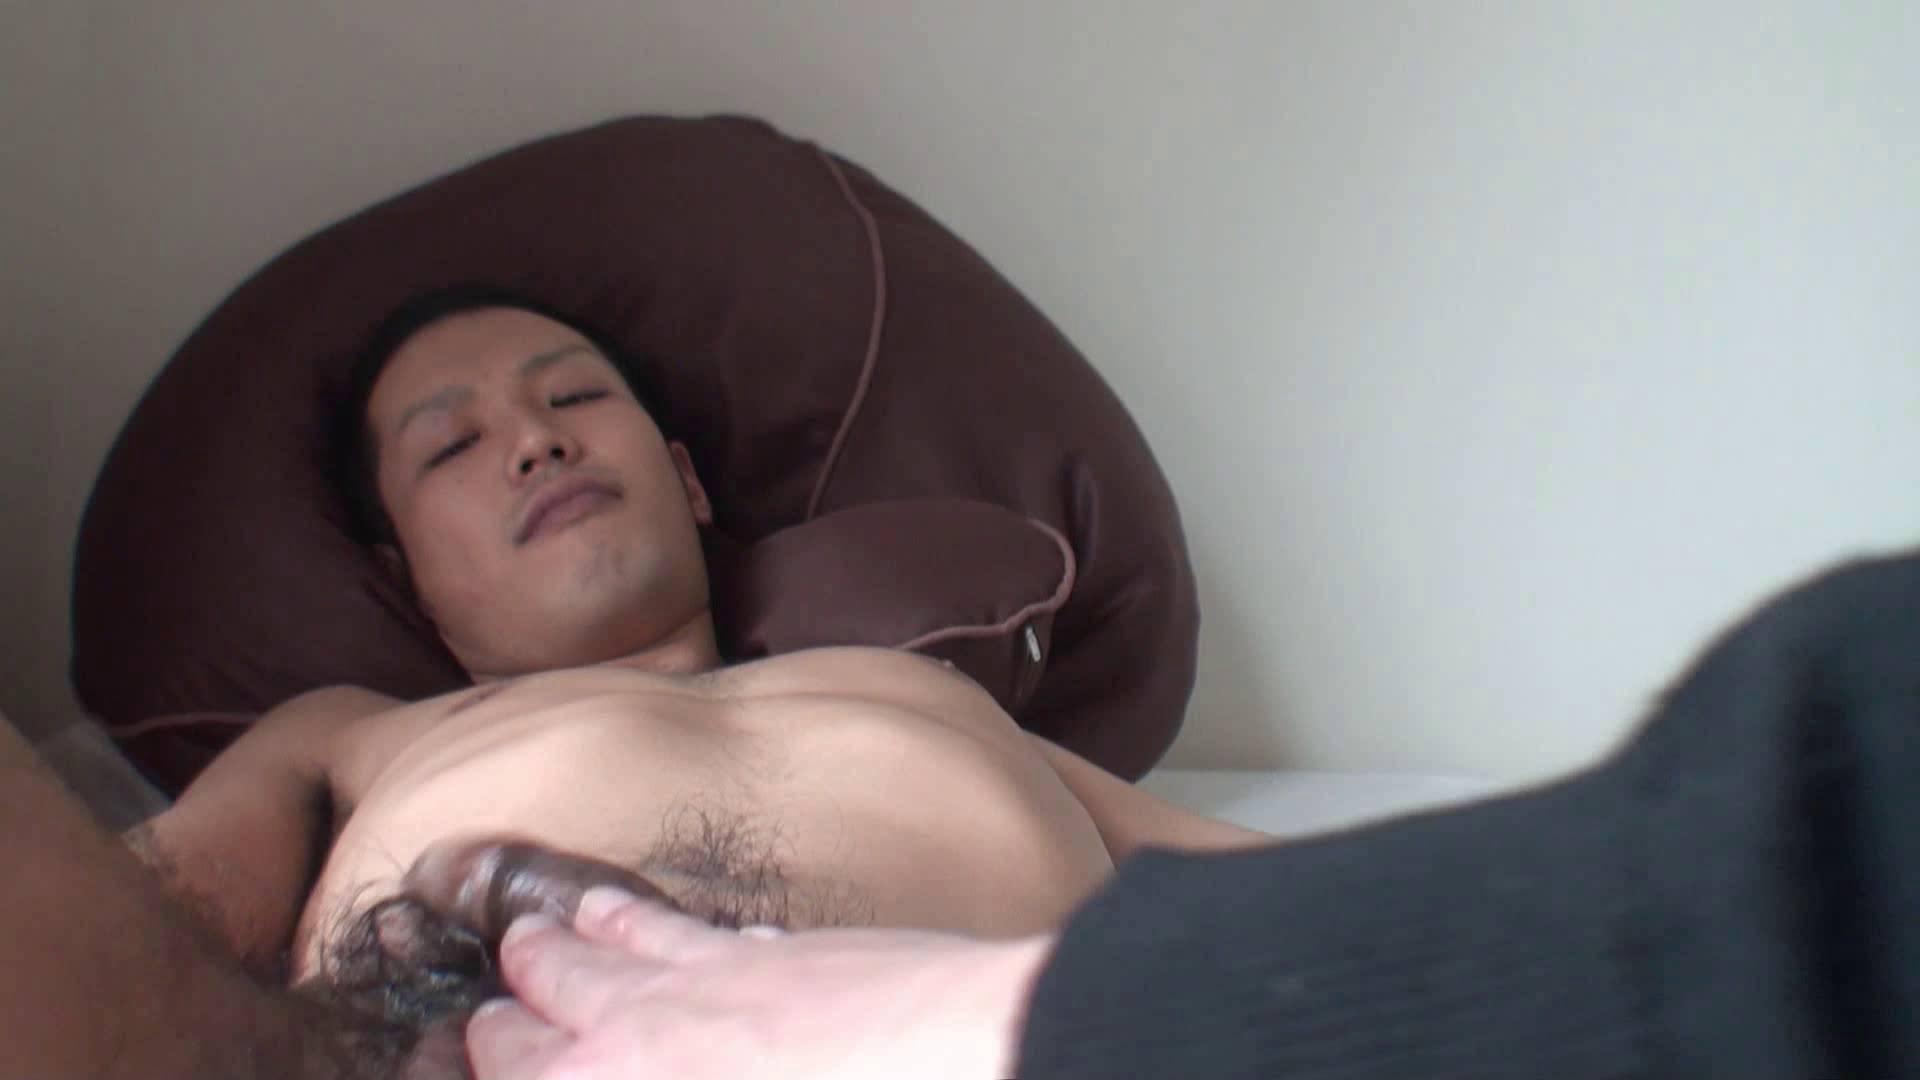 HD 良太と健二当たり前の日常 セックス編 手コキ技あり ゲイフリーエロ画像 65枚 4